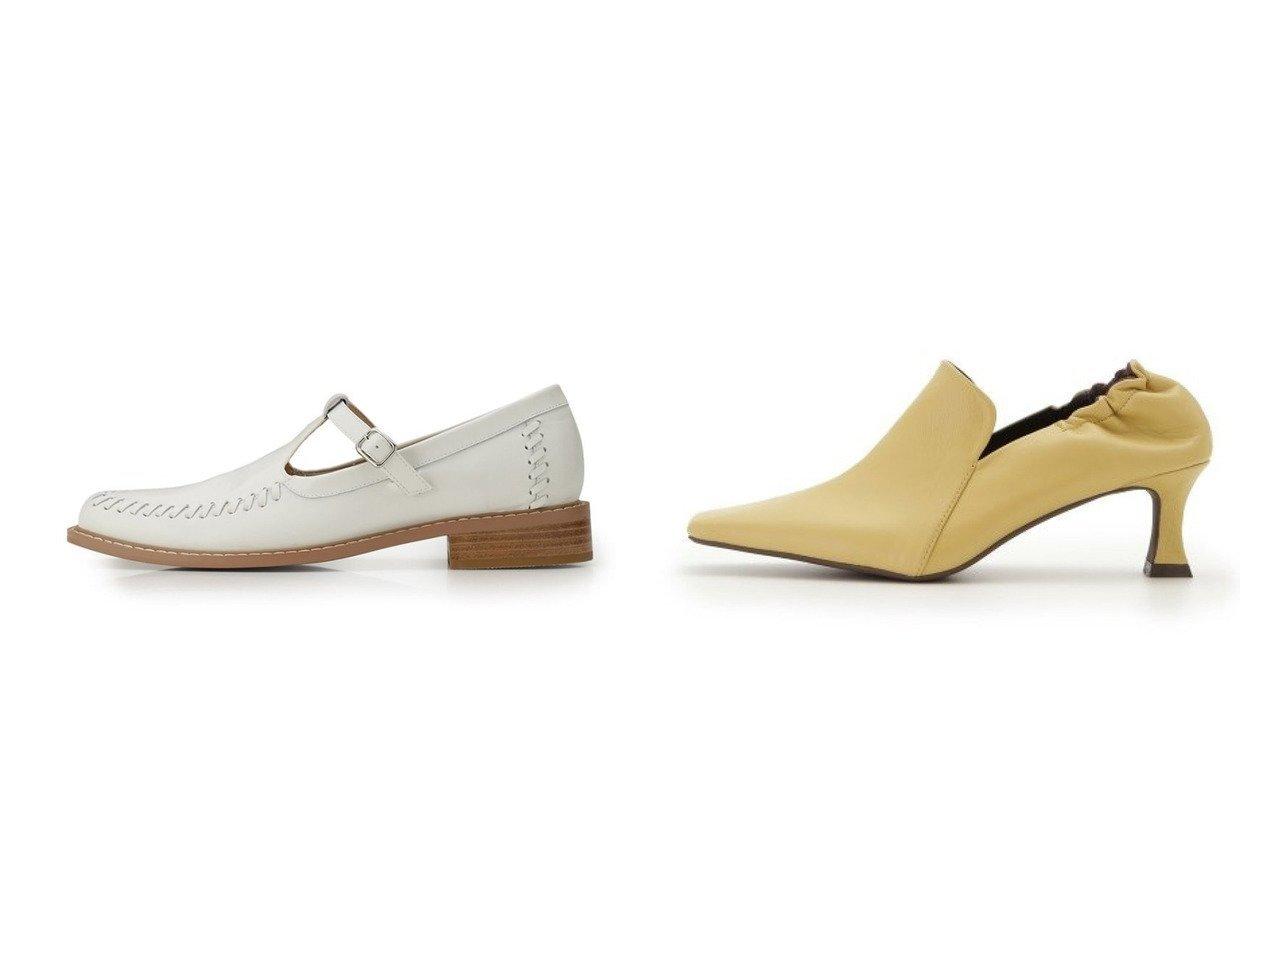 【Mila Owen/ミラオーウェン】のバッグギャザーオペラパンプス&【FURFUR/ファーファー】のTストラップローファー シューズ・靴のおすすめ!人気、トレンド・レディースファッションの通販  おすすめで人気の流行・トレンド、ファッションの通販商品 メンズファッション・キッズファッション・インテリア・家具・レディースファッション・服の通販 founy(ファニー) https://founy.com/ ファッション Fashion レディースファッション WOMEN シューズ ソックス ラップ 定番 12月号 バランス フィット フェイクレザー フレア 春  ID:crp329100000009847